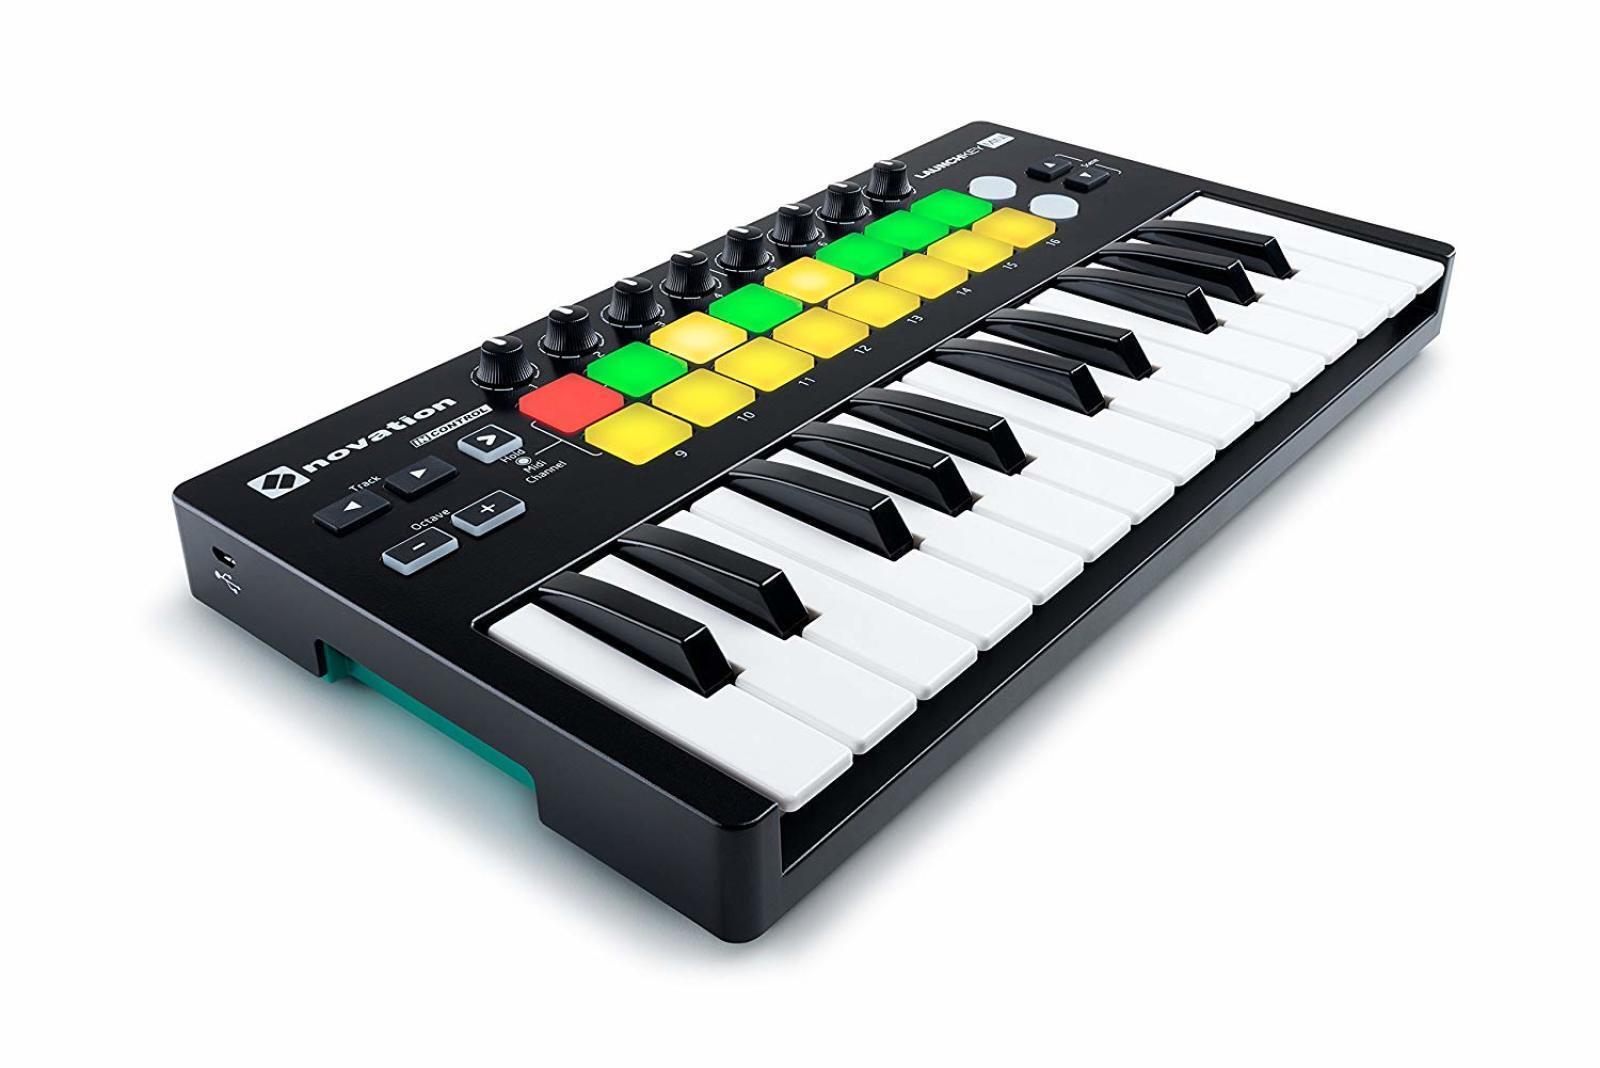 Details about Beat & Music Maker DJ Piano USB MIDI Mini Drum Pad & Keyboard  Controller MK2 25K